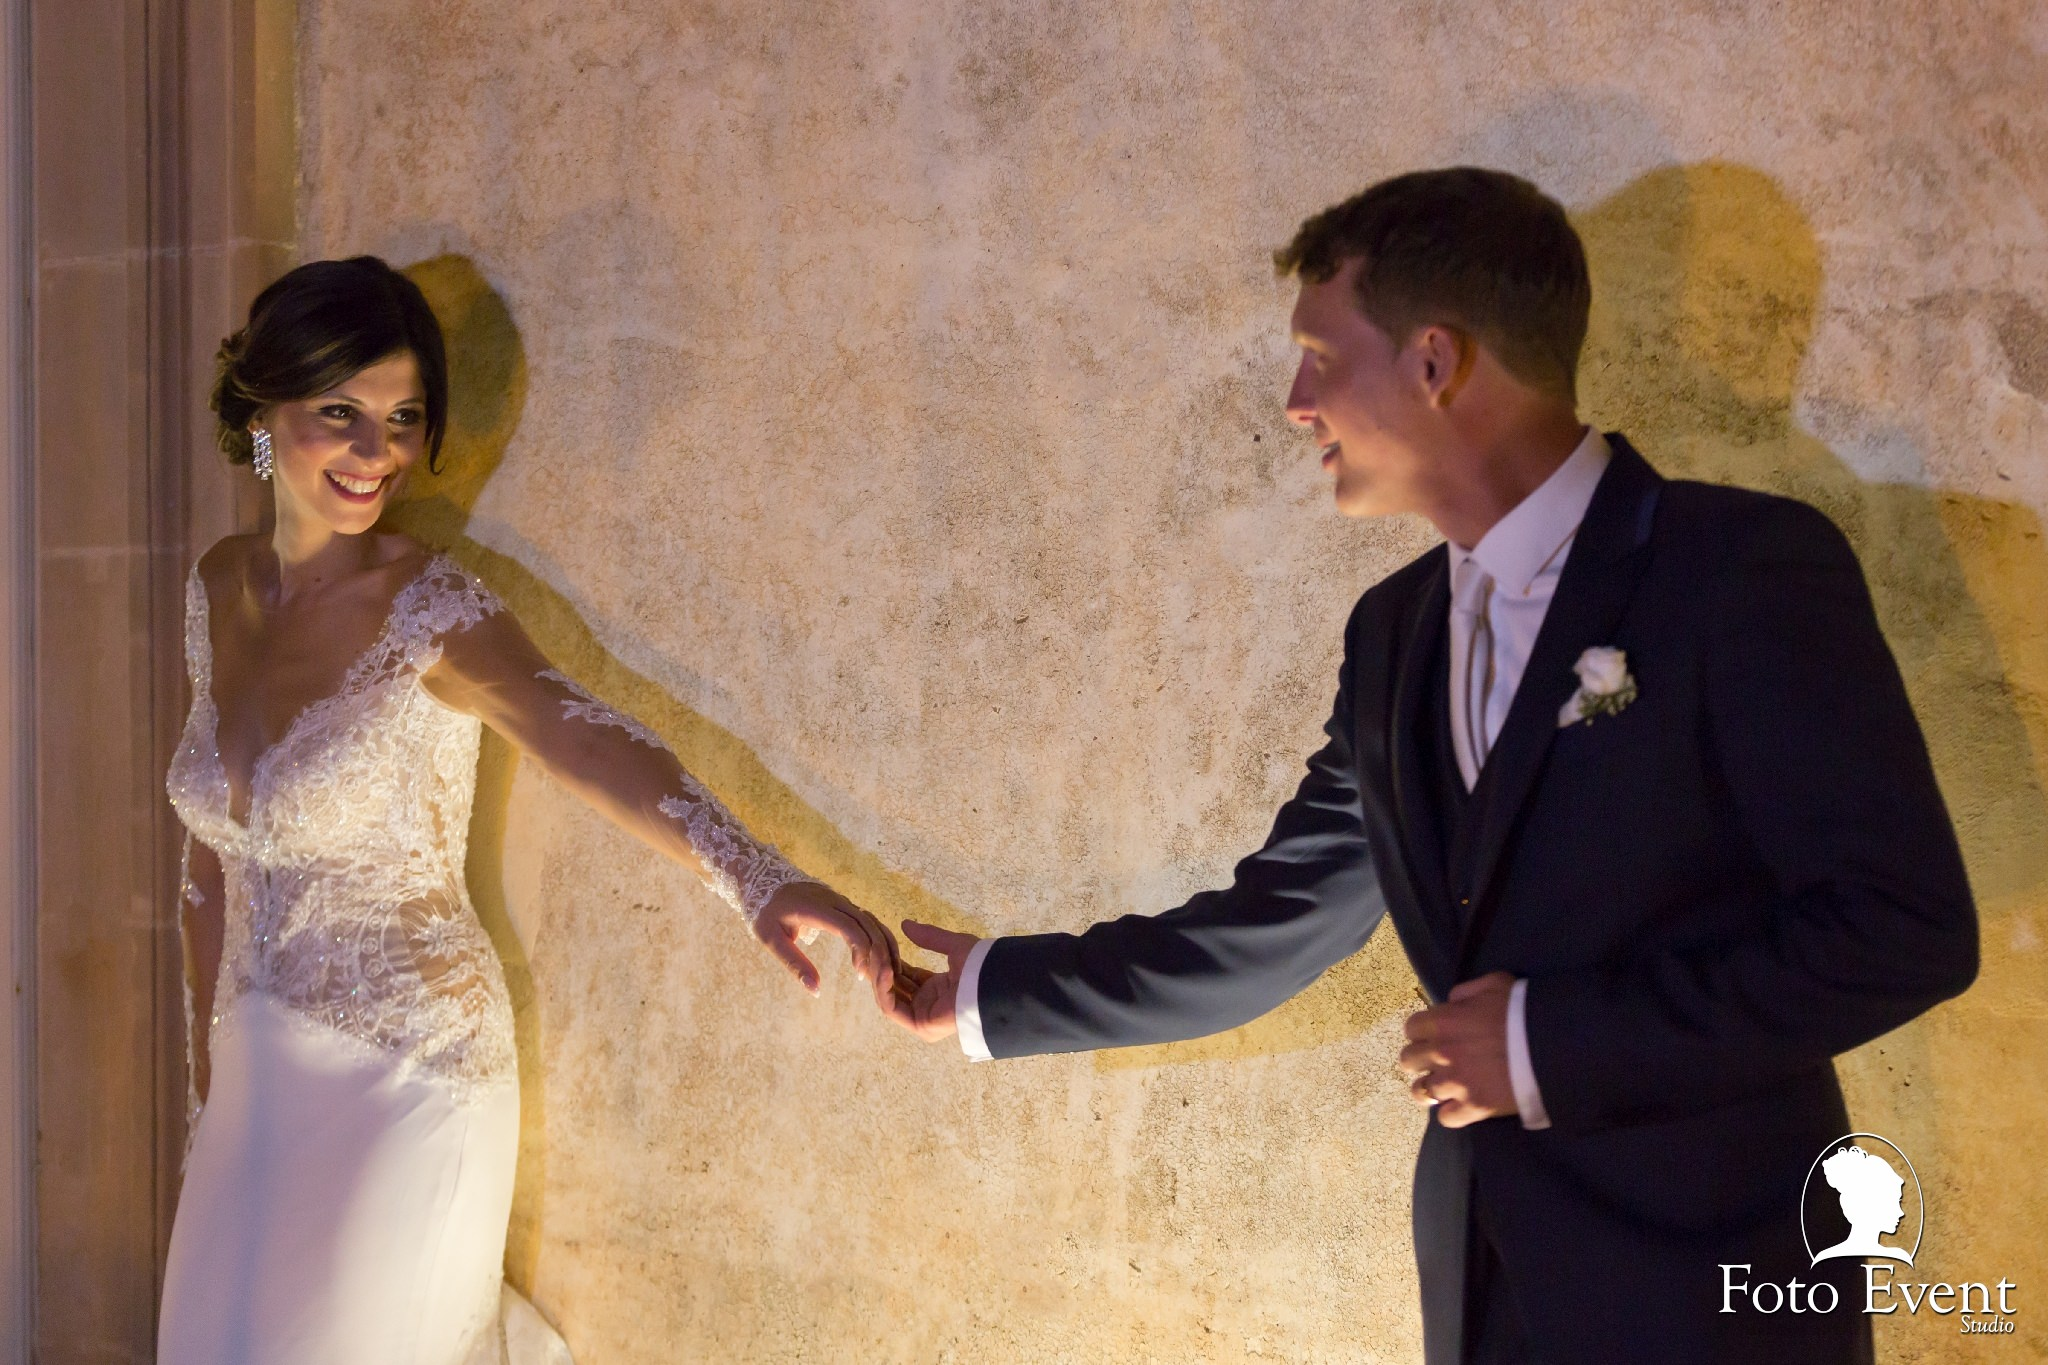 2017-07-21 Matrimonio Adriana e Giuseppe Dorsi zoom 321 CD FOTO